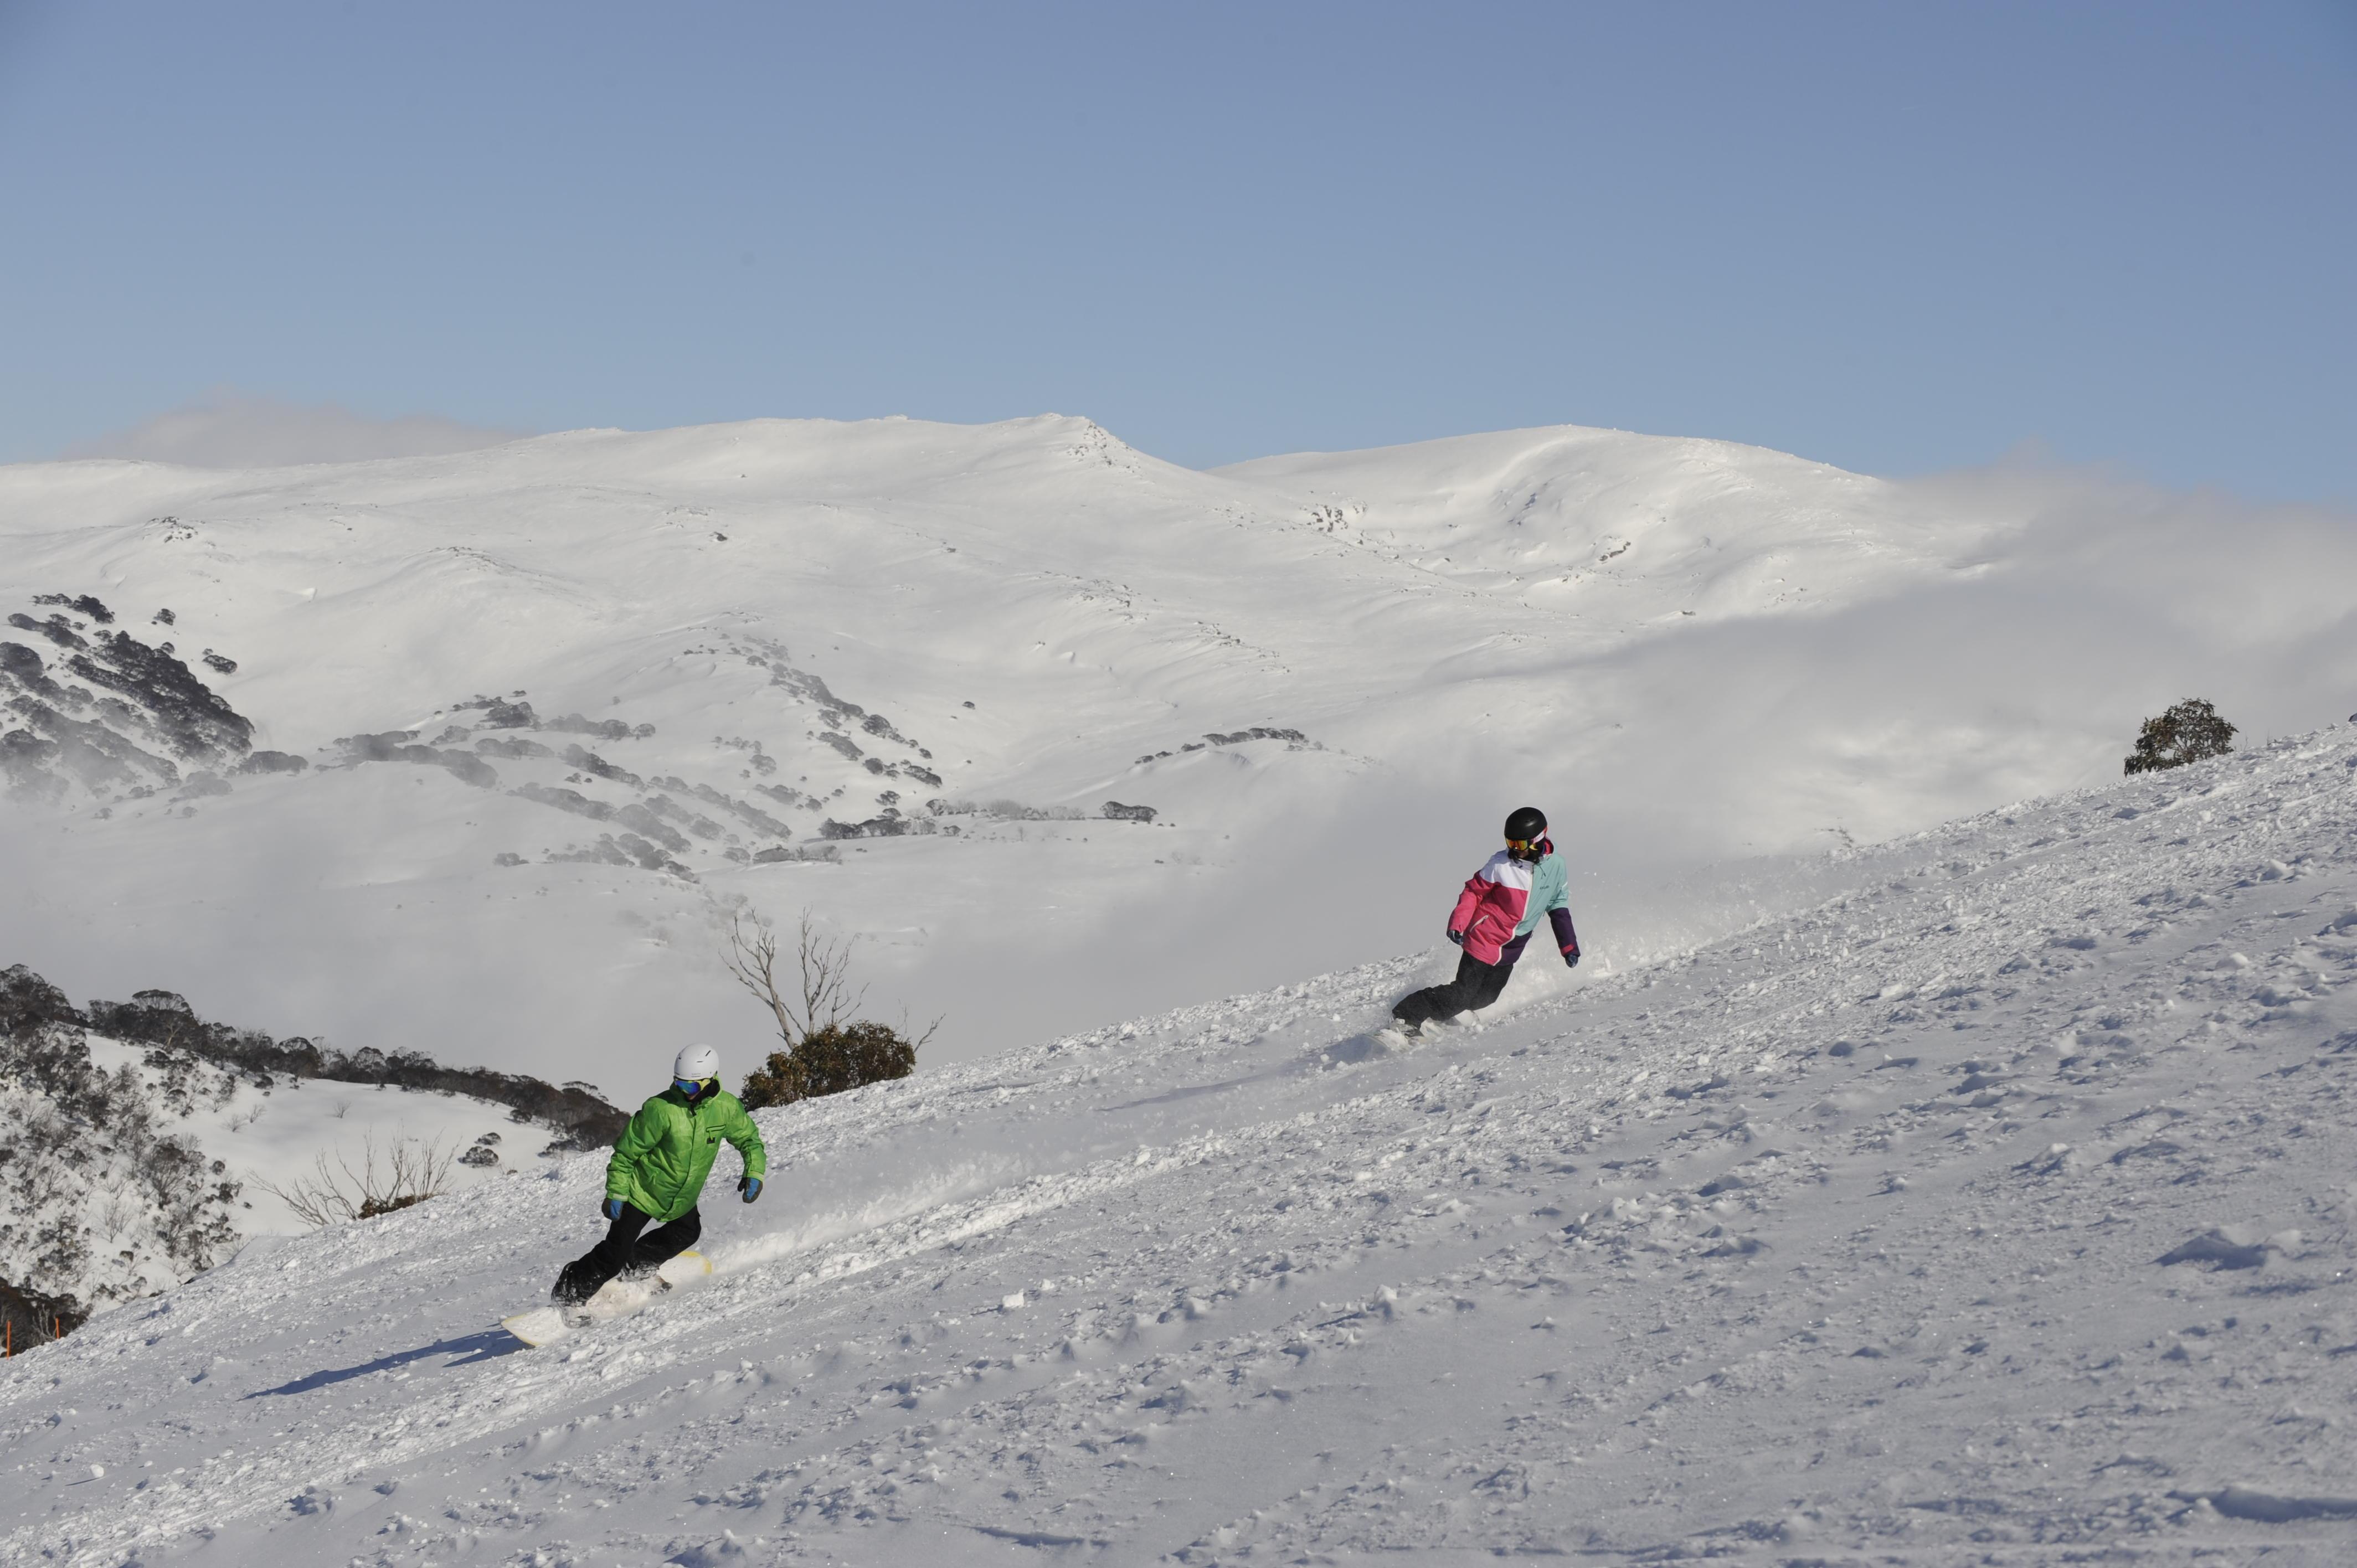 Snowboarding at Guthega, Perisher